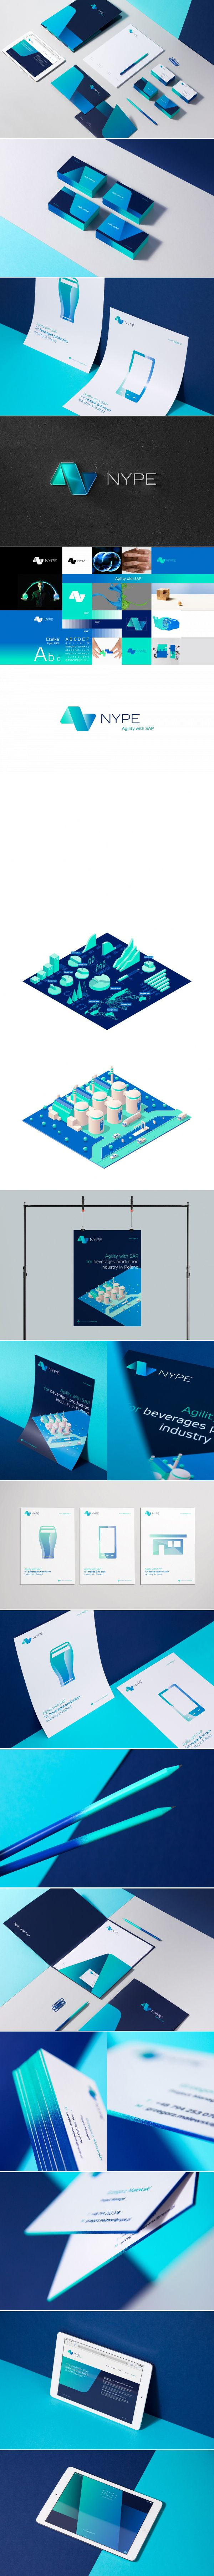 Nype Brand Design www.kommunikat.pl/portfolio/nype/